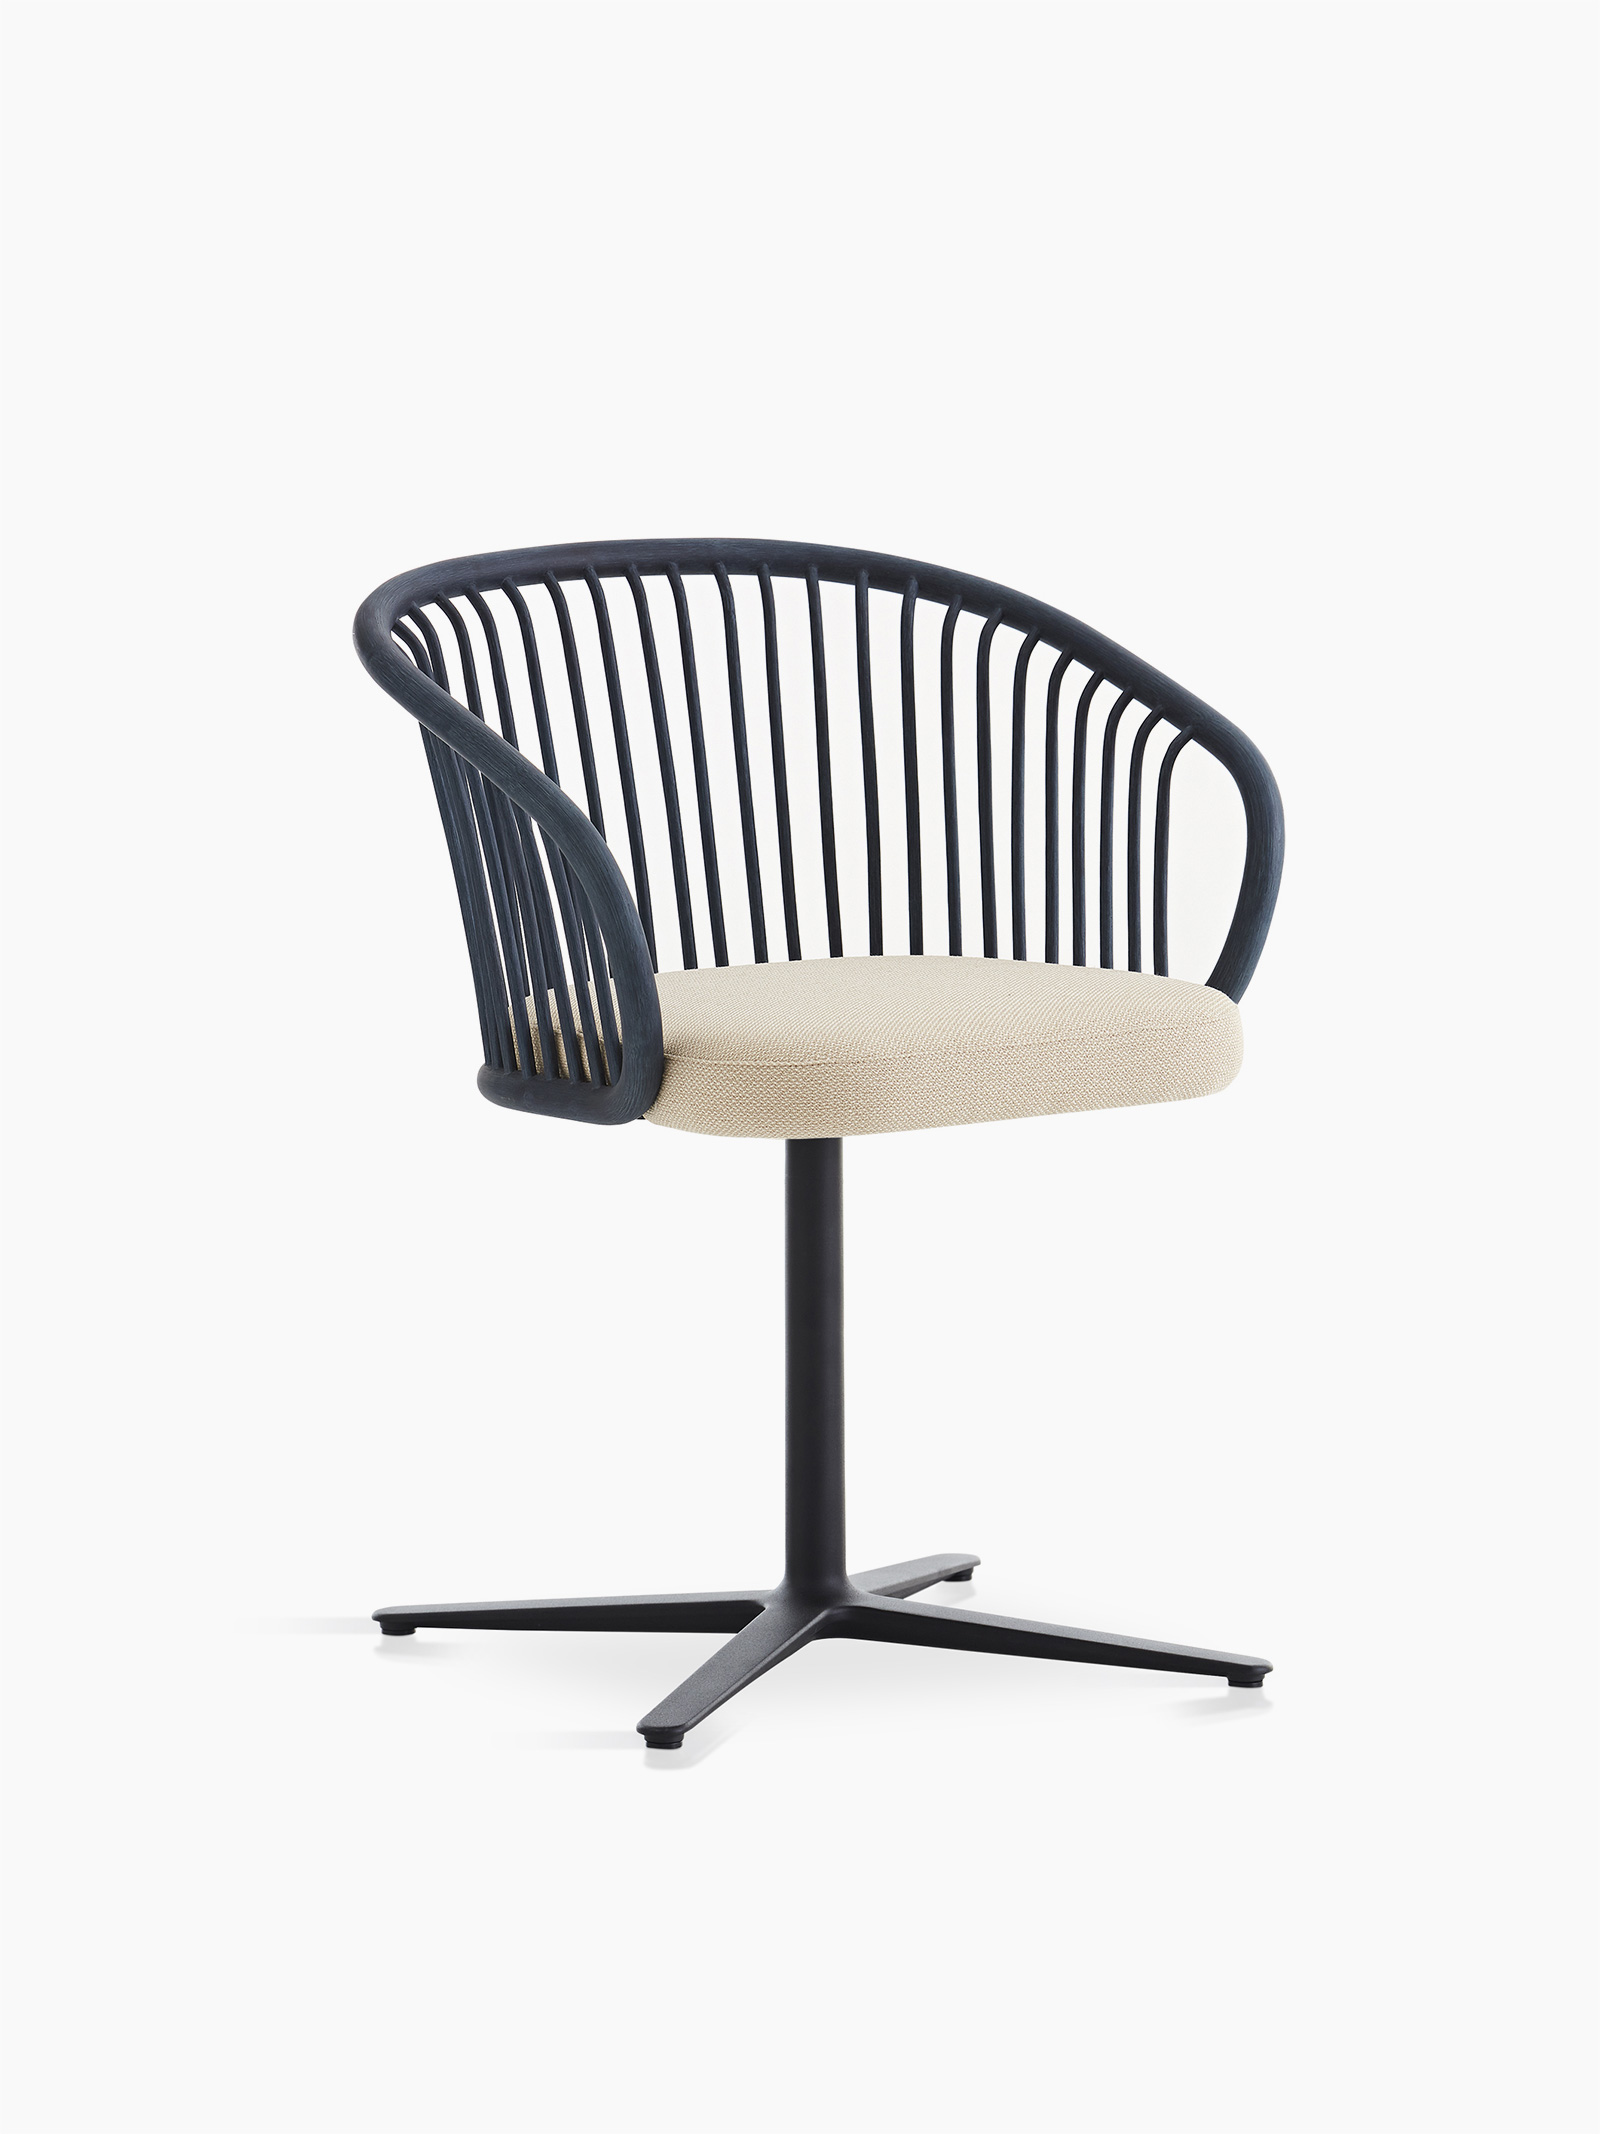 TinnappleMetz-Expormim-huma-armchair-03